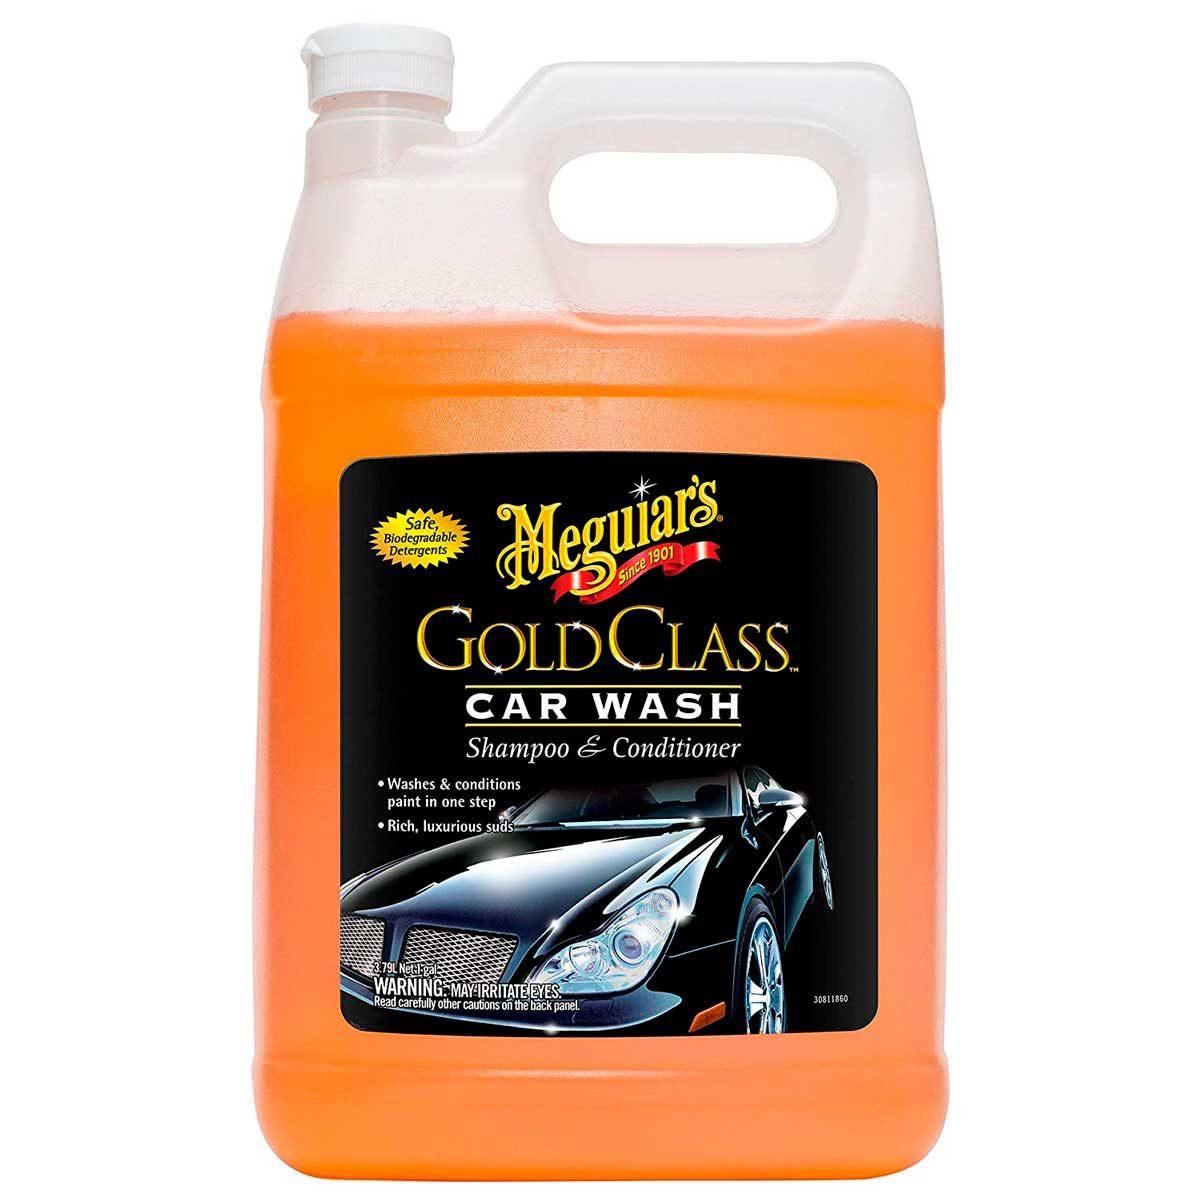 Meguiars car wash